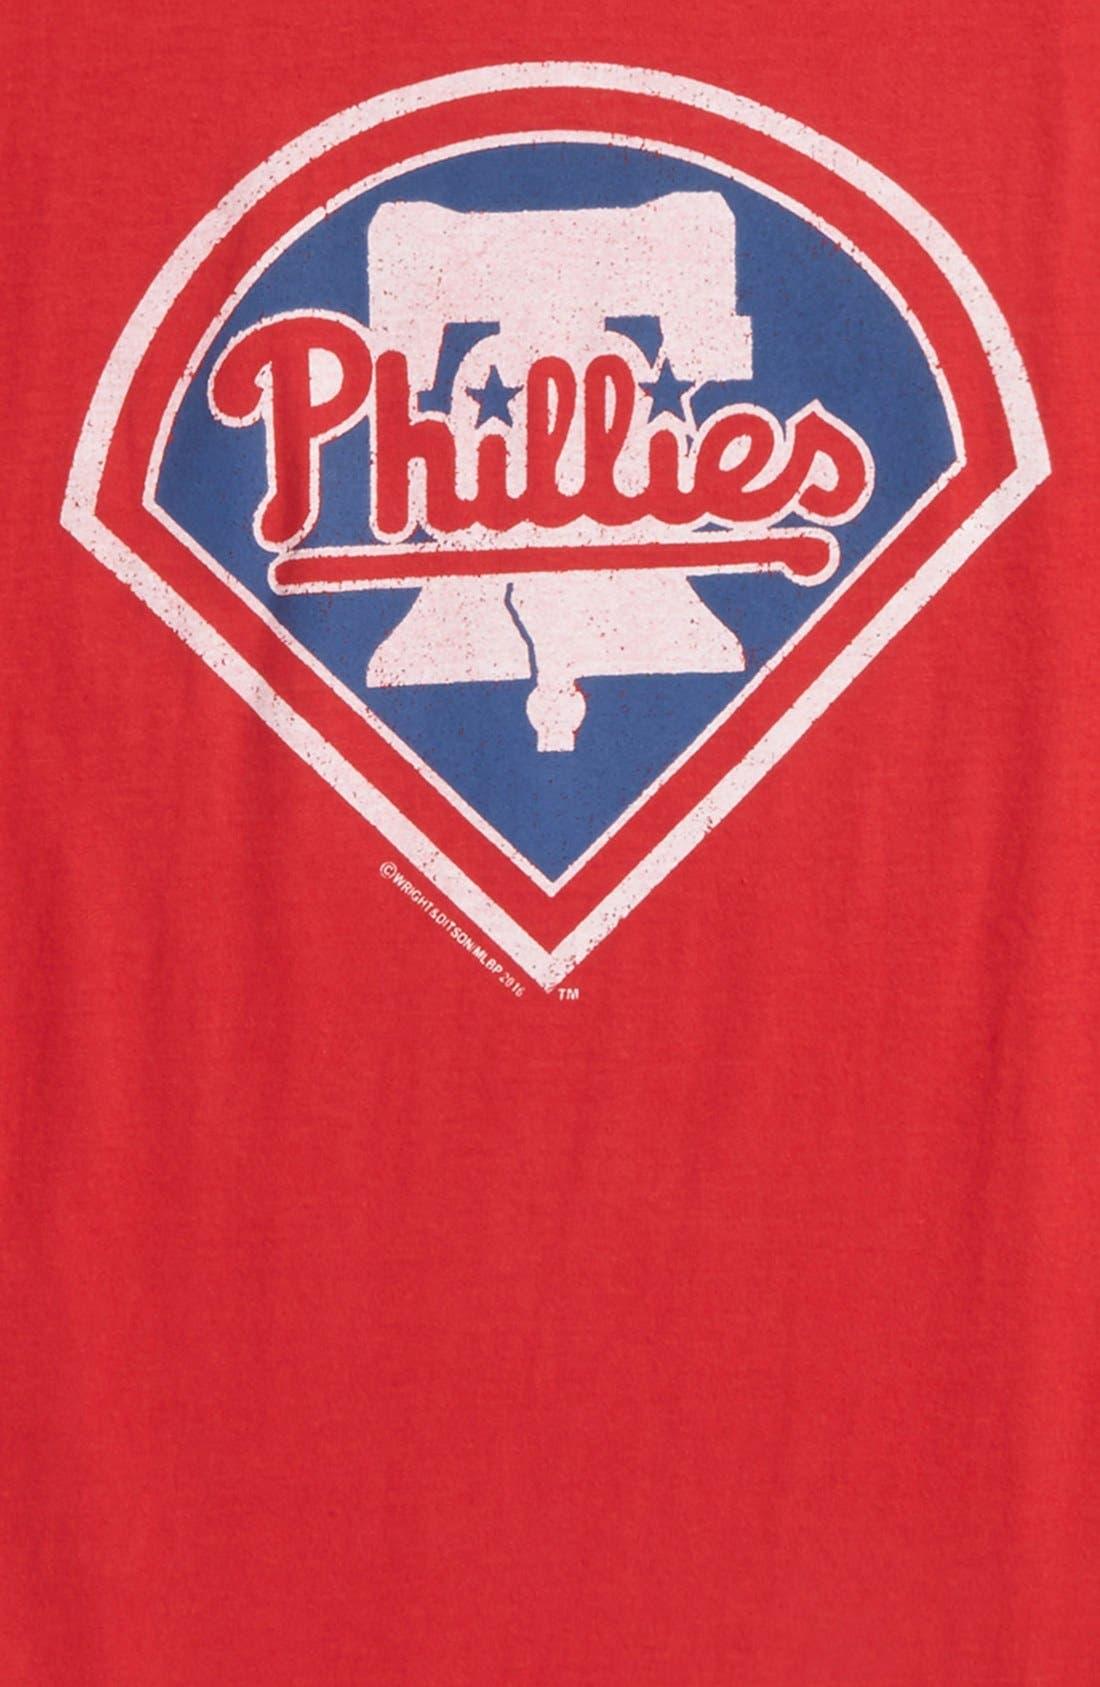 'Philadelphia Phillies' T-Shirt,                             Alternate thumbnail 2, color,                             Red